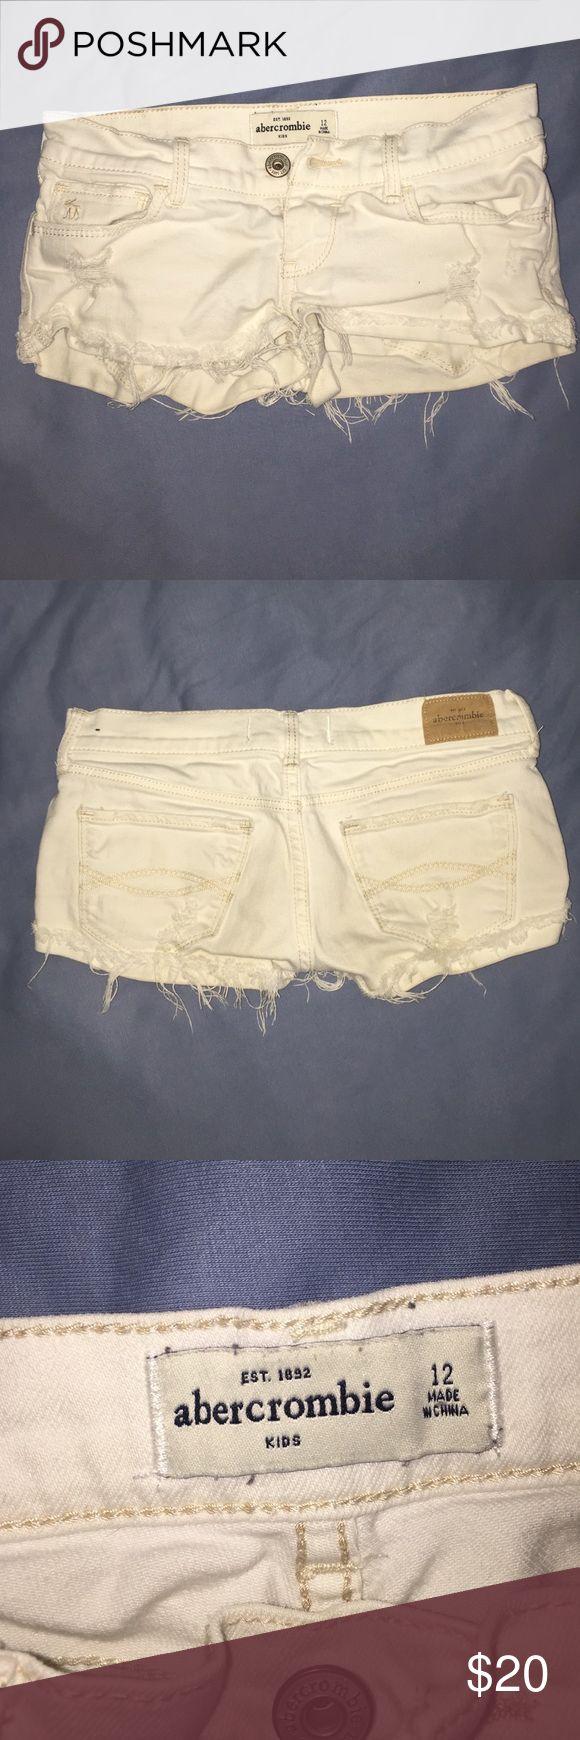 abercrombie kids white jean shorts white jean shorts, size 12 abercrombie kids Shorts Jean Shorts